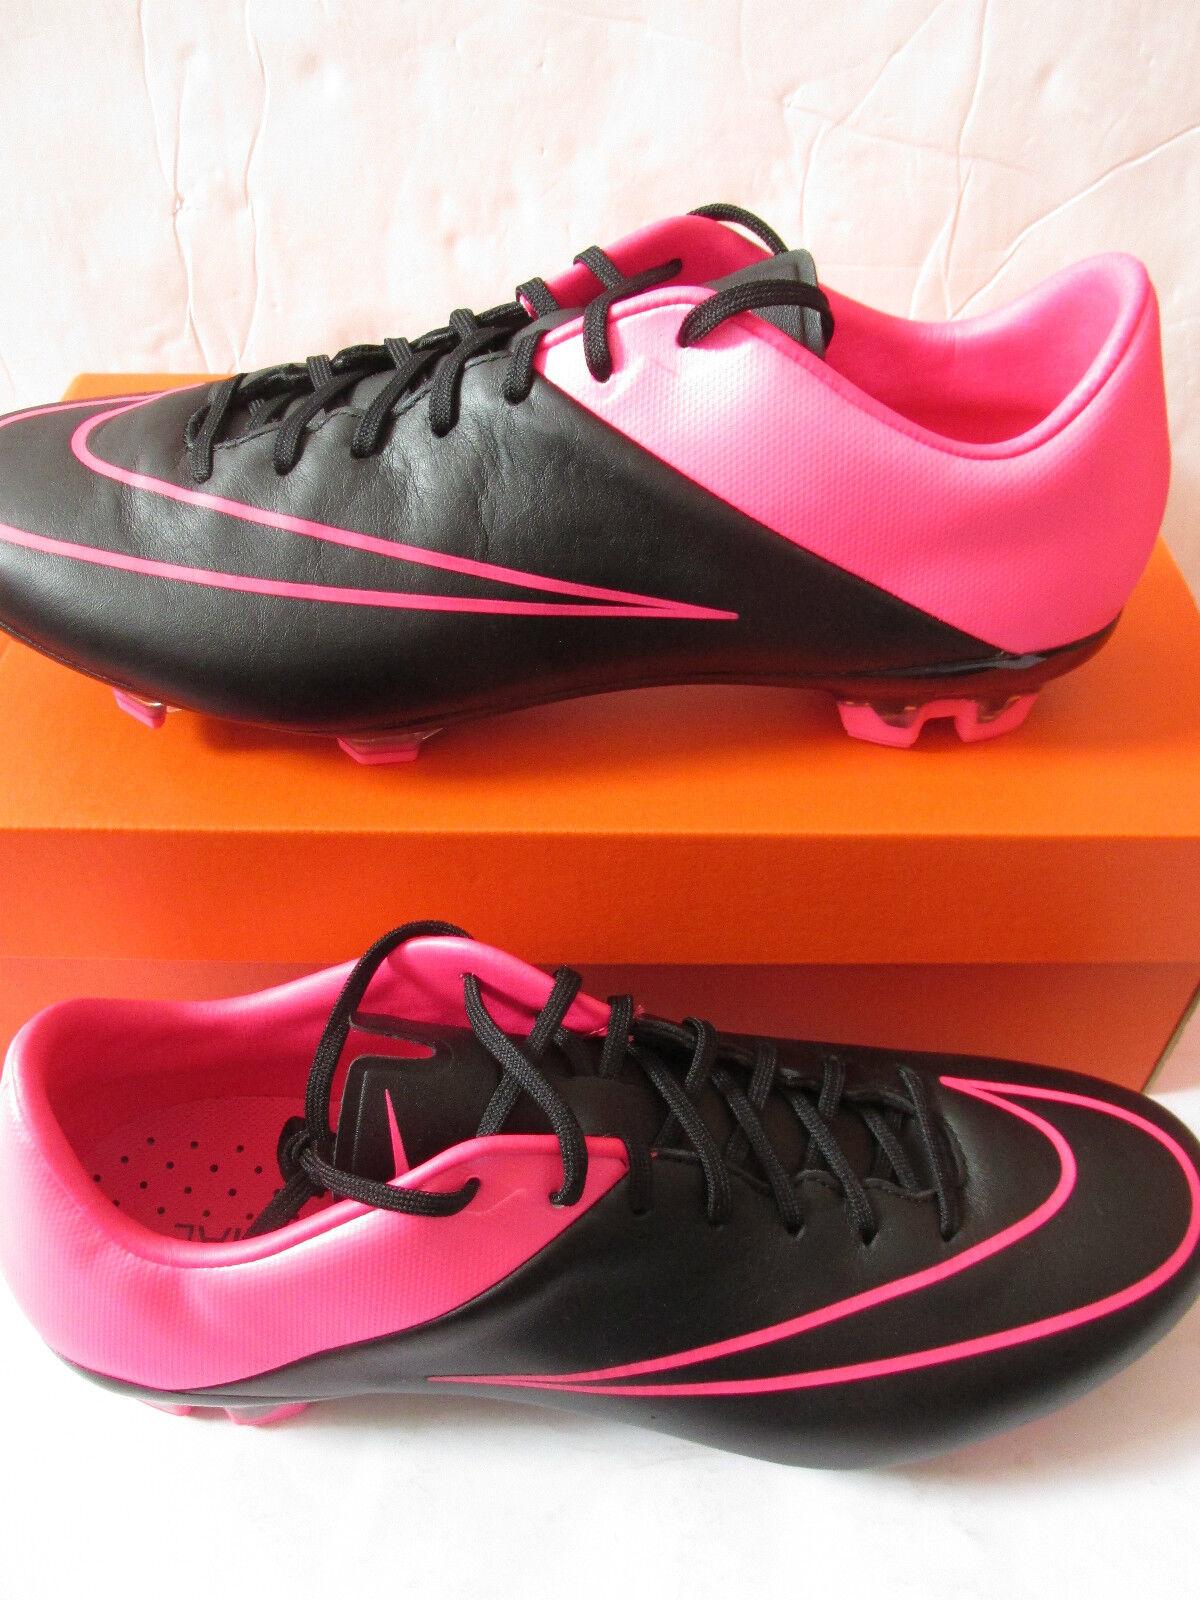 Nike Mercurial Veloce II Lthr Lthr Lthr Fg Hombre botas de Fútbol 768808 006 Fútbol Tacos 4c5896